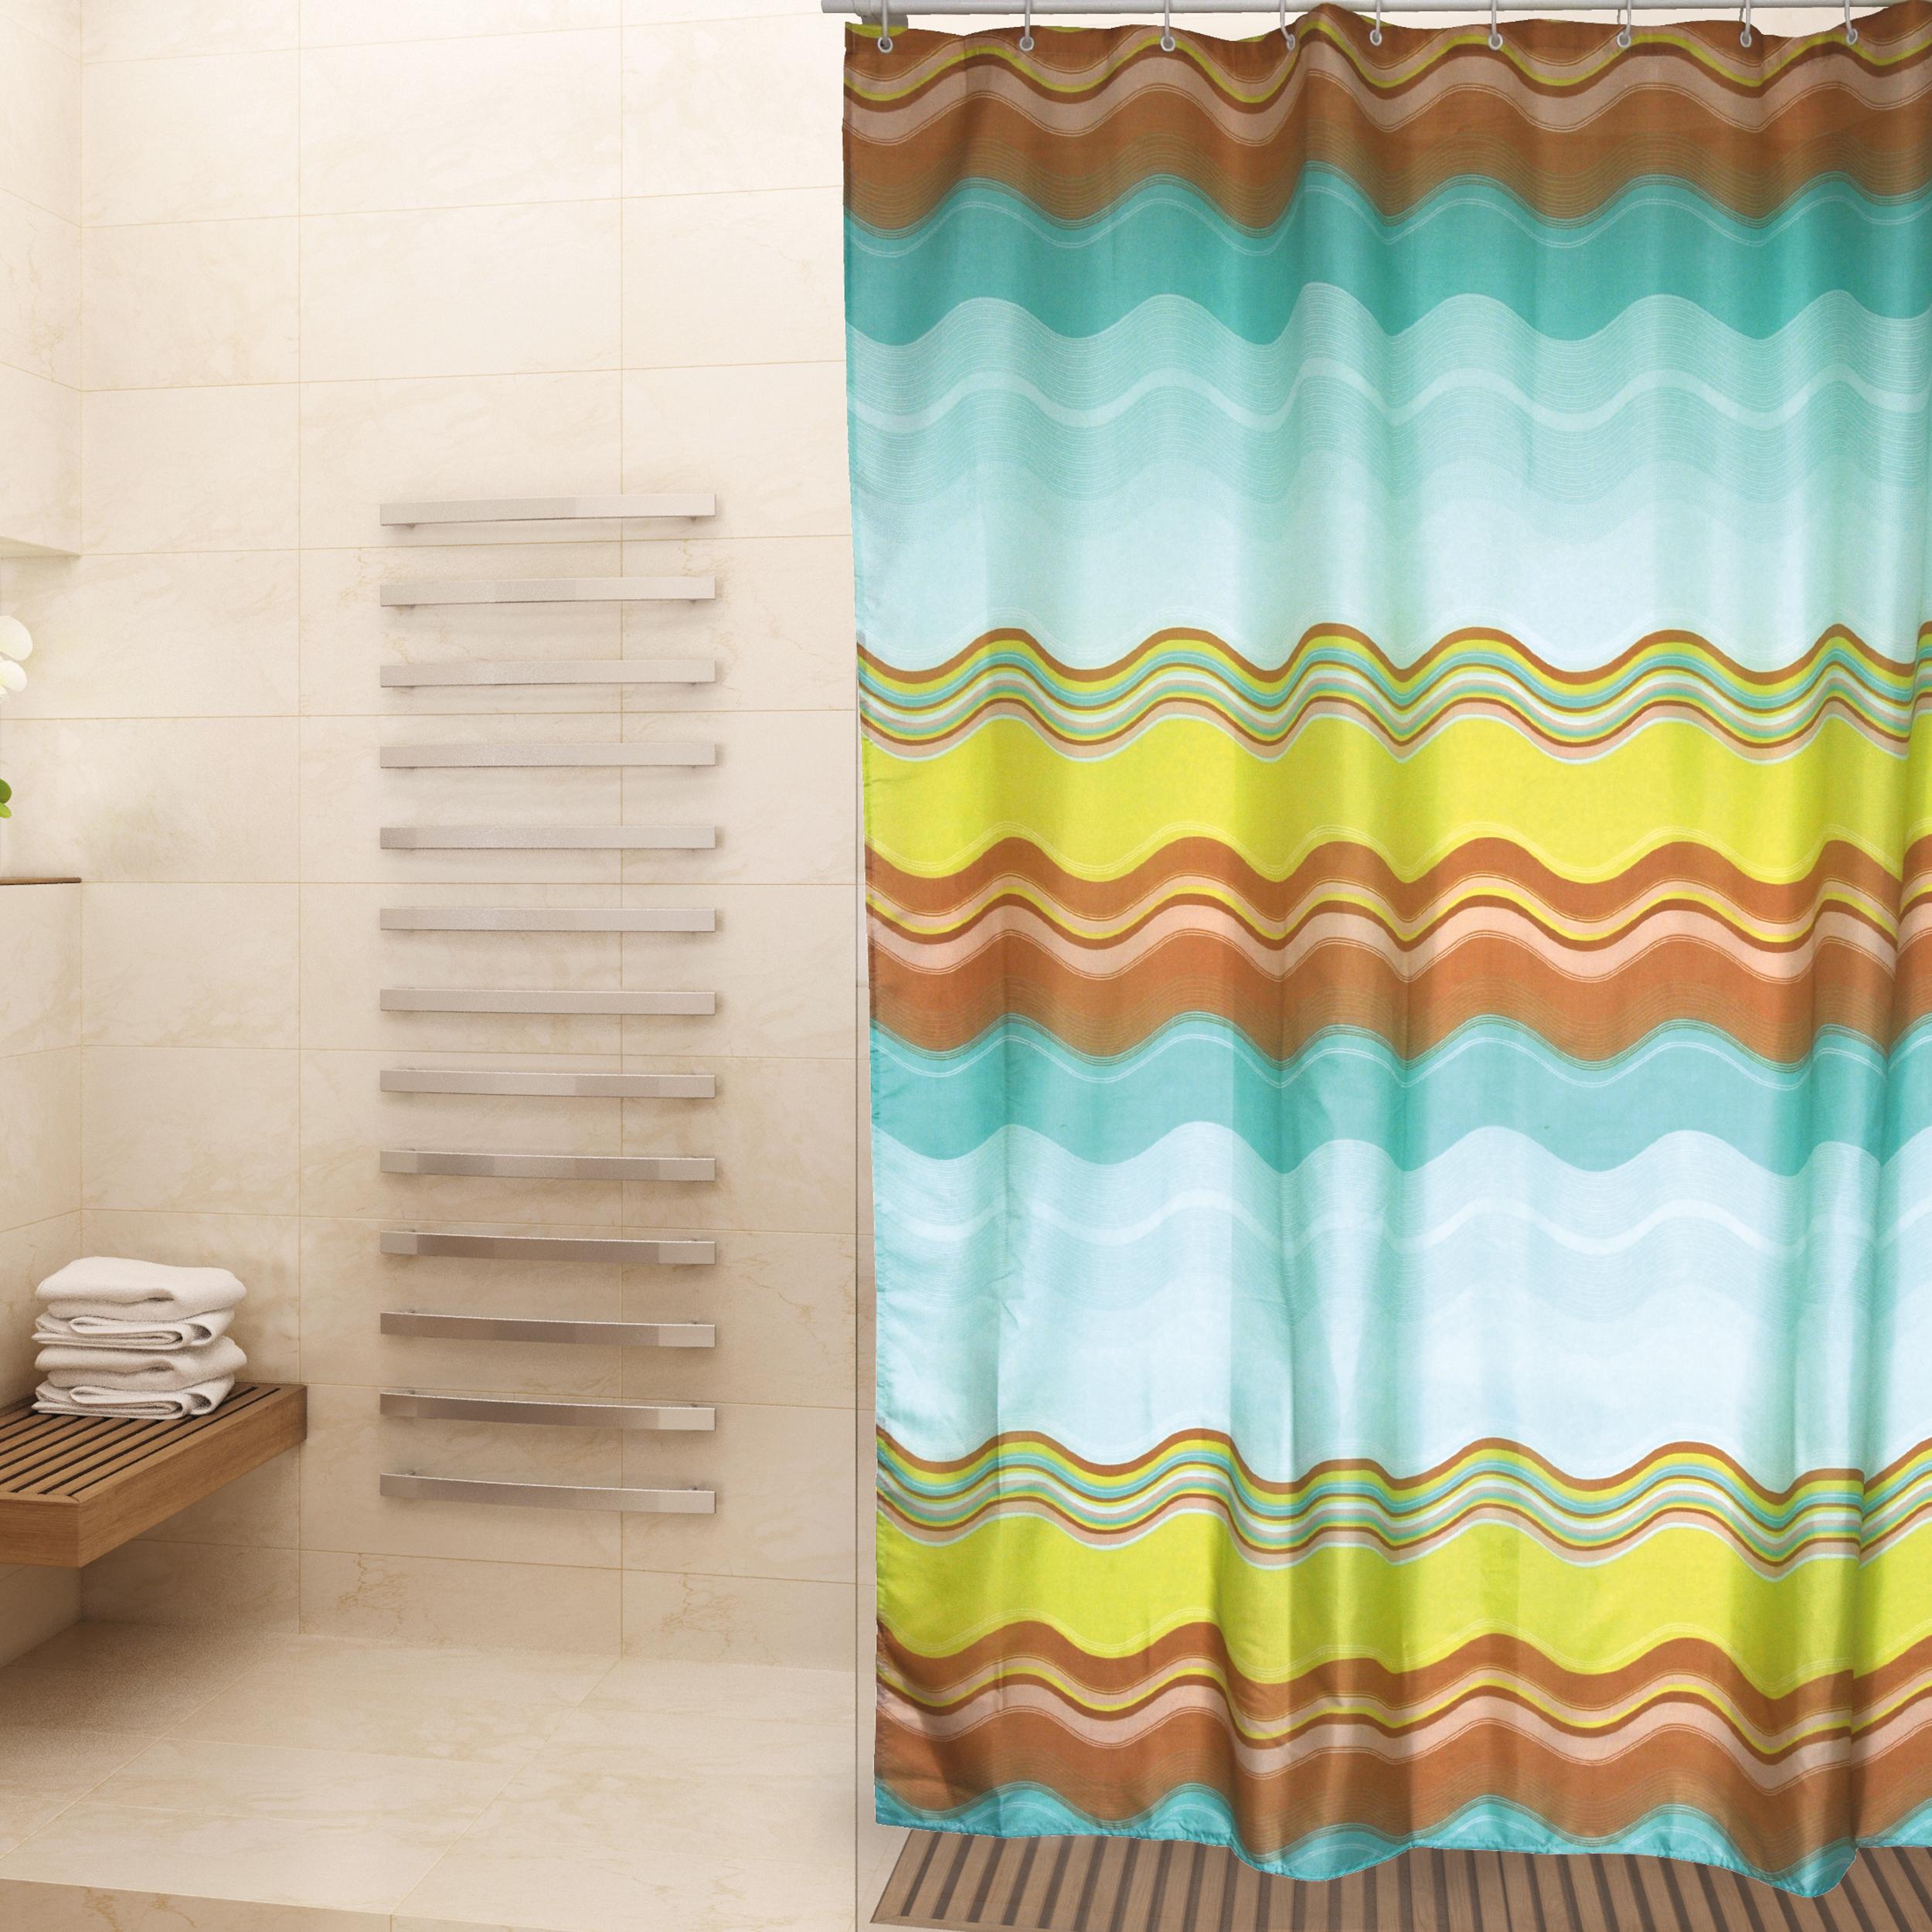 MSV Duschvorhang 180x200cm Anti Schimmel Textil Badewannenvorhang Wannenvorhang Rainbow